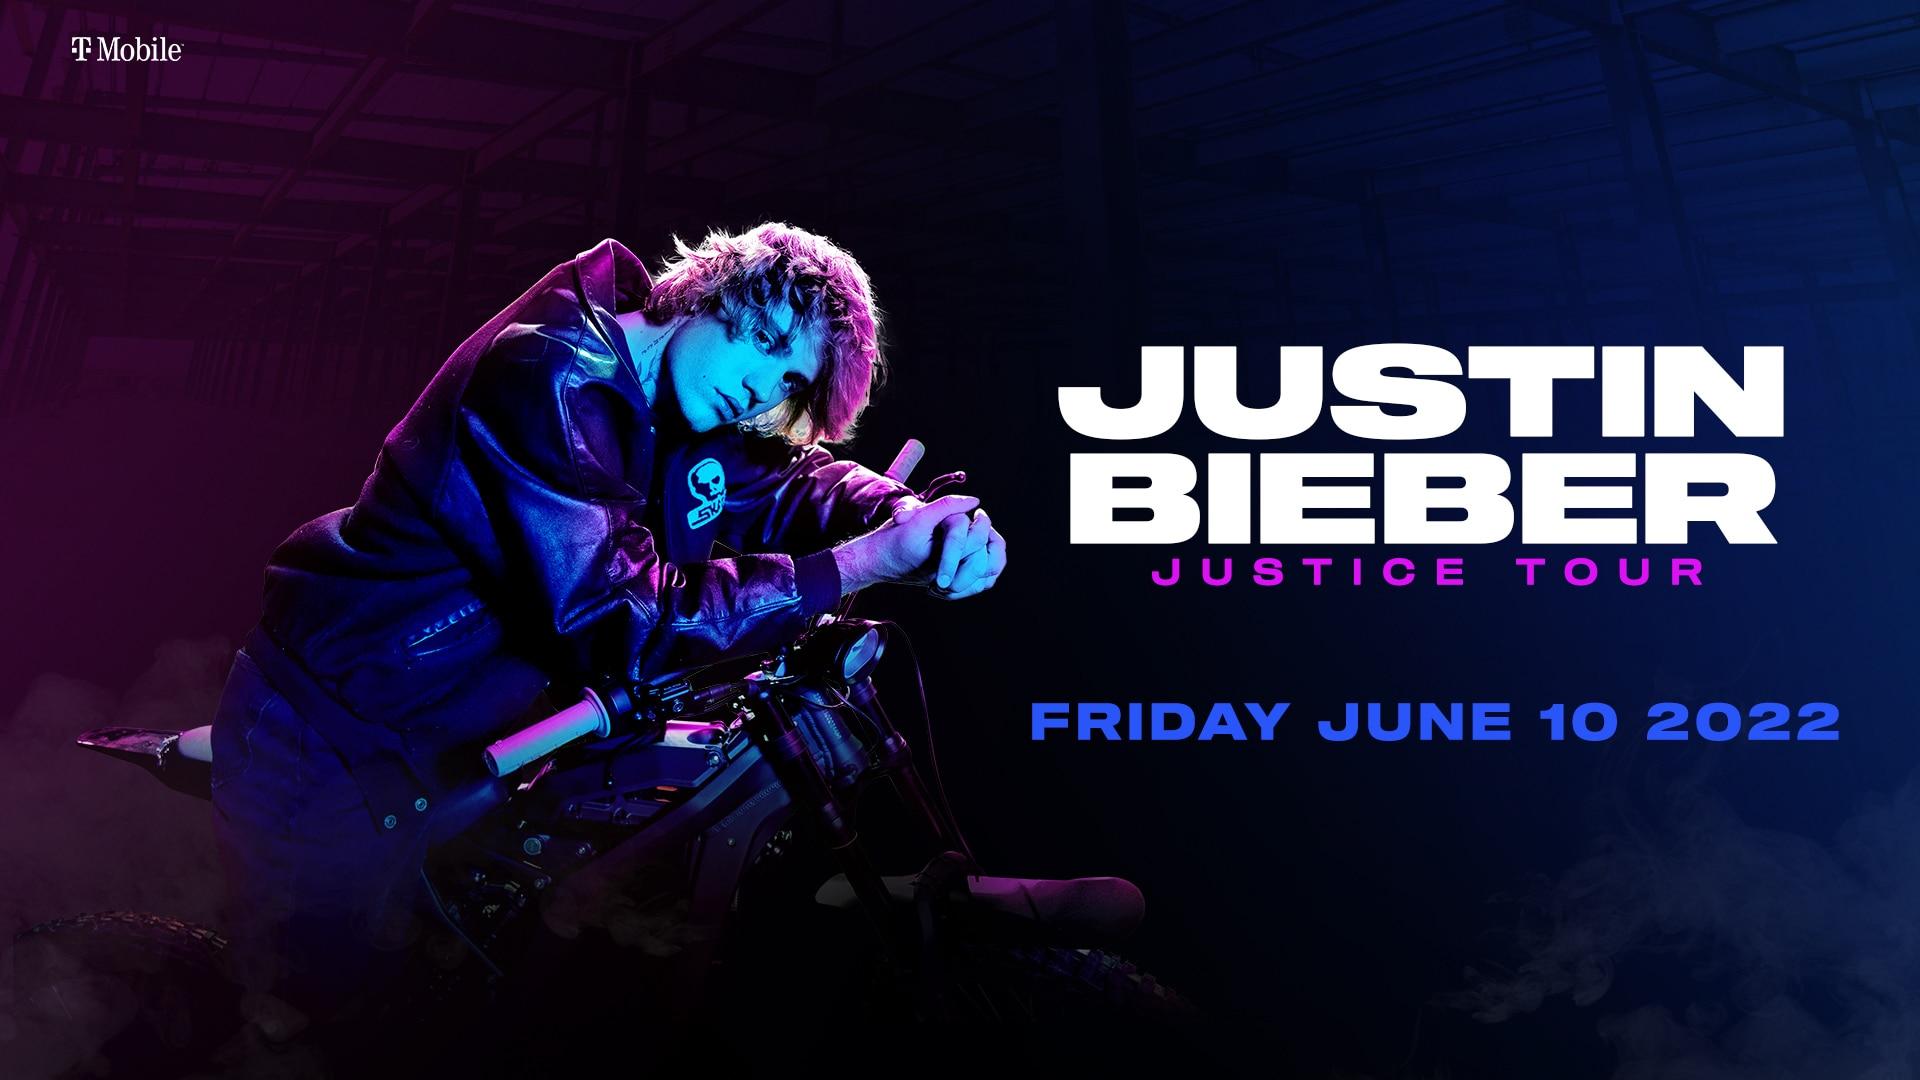 Justin Bieber Justice World Tour: June 10, 2022